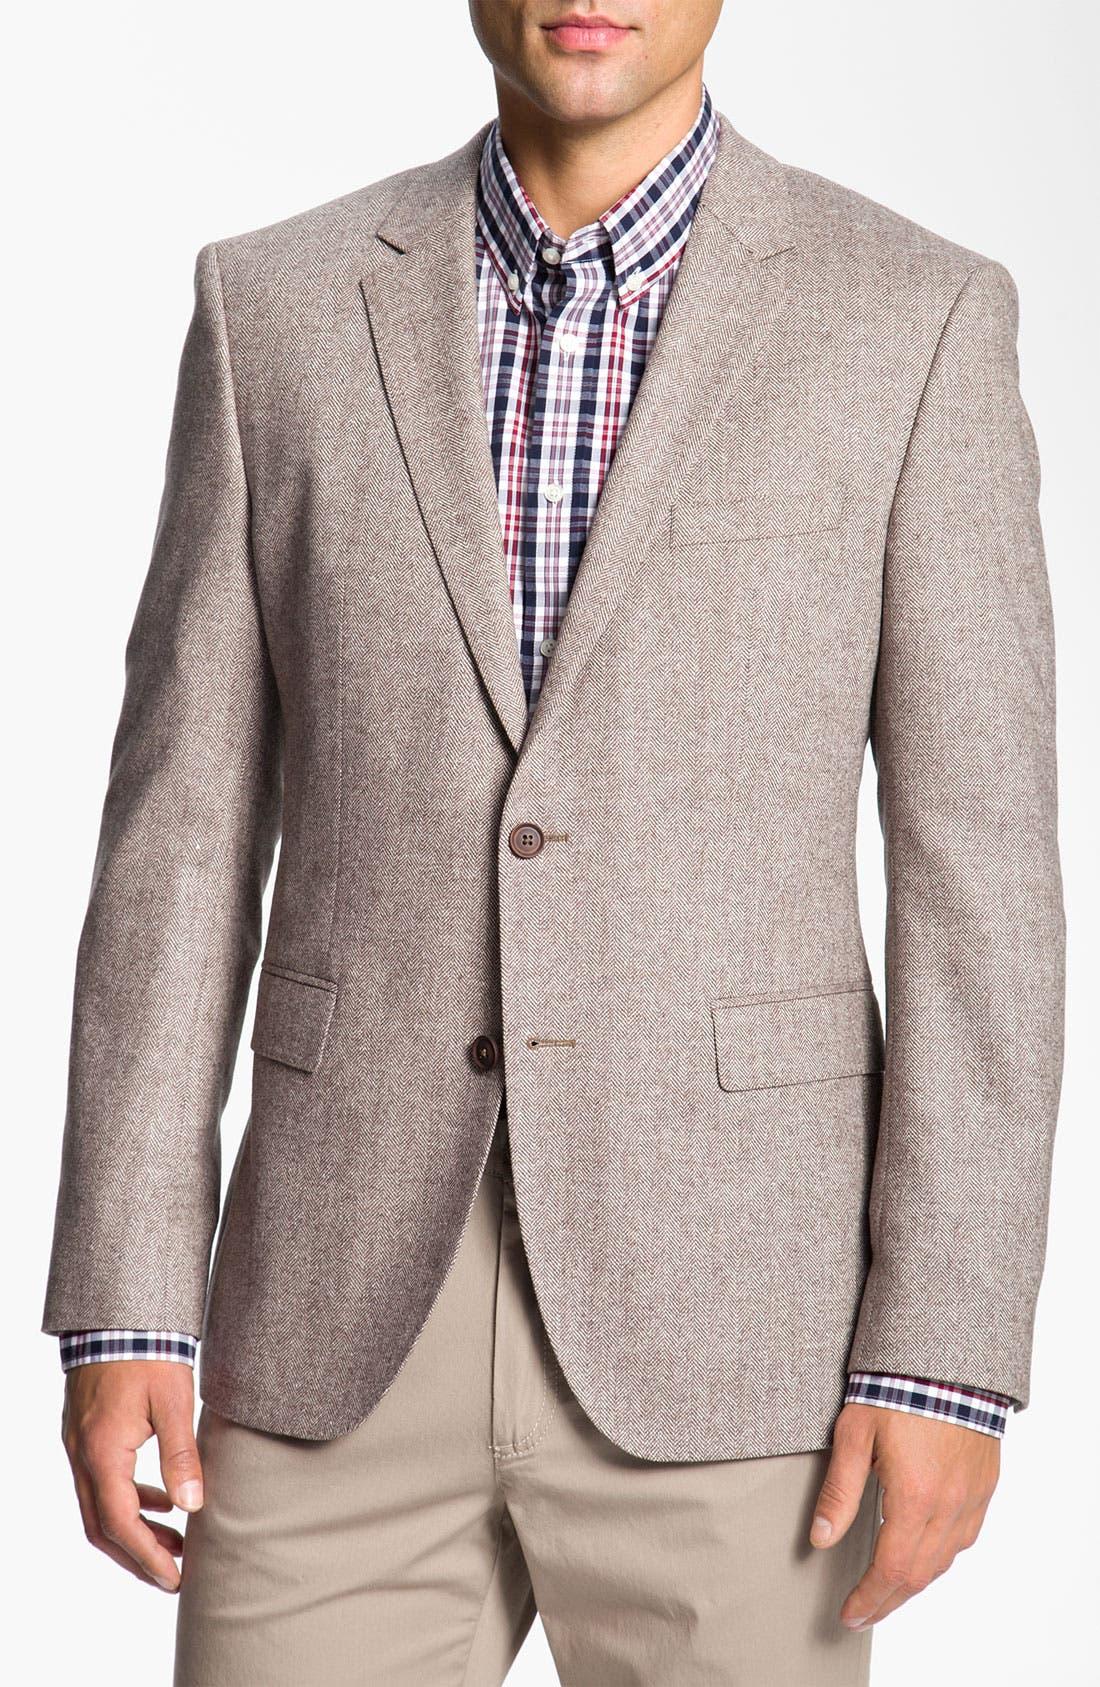 Alternate Image 1 Selected - BOSS Black 'Smith' Trim Fit Herringbone Sportcoat